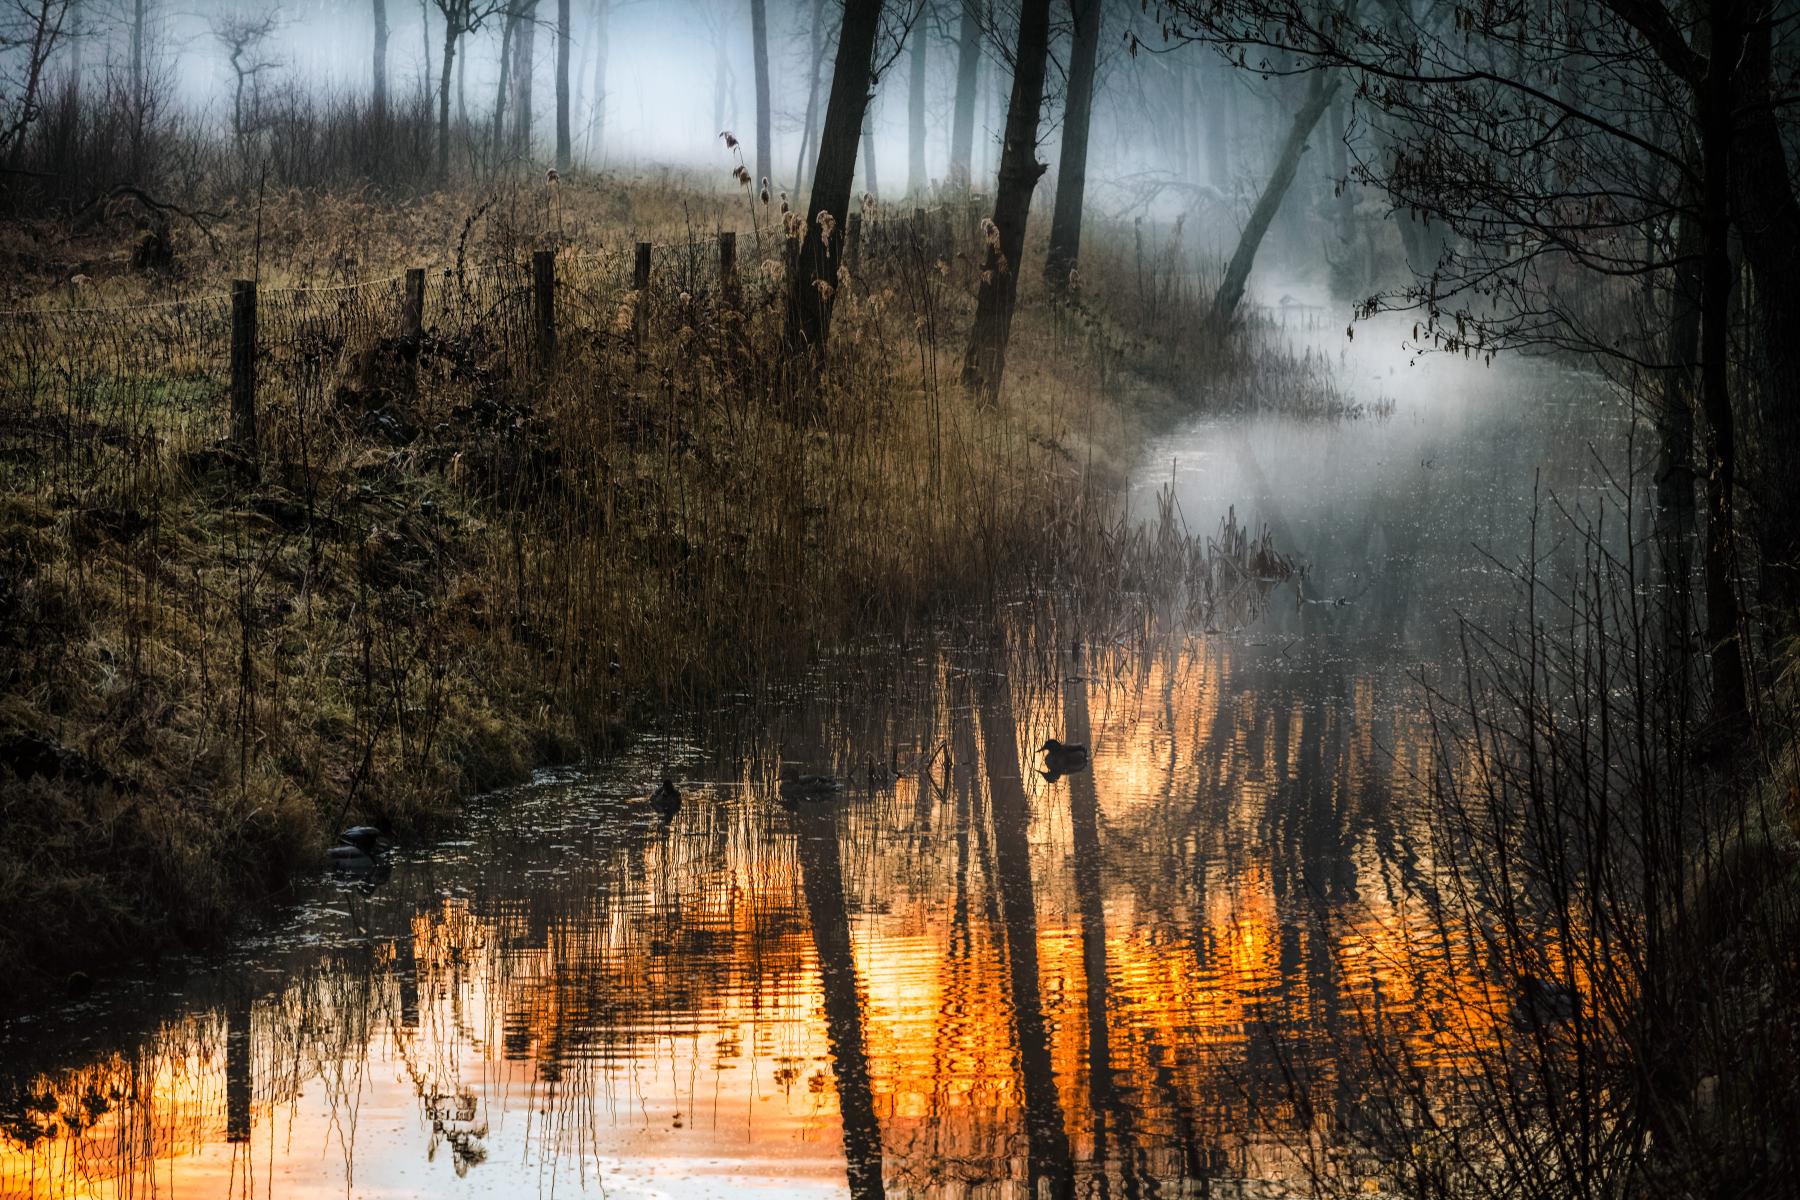 misty forest stream at dawn